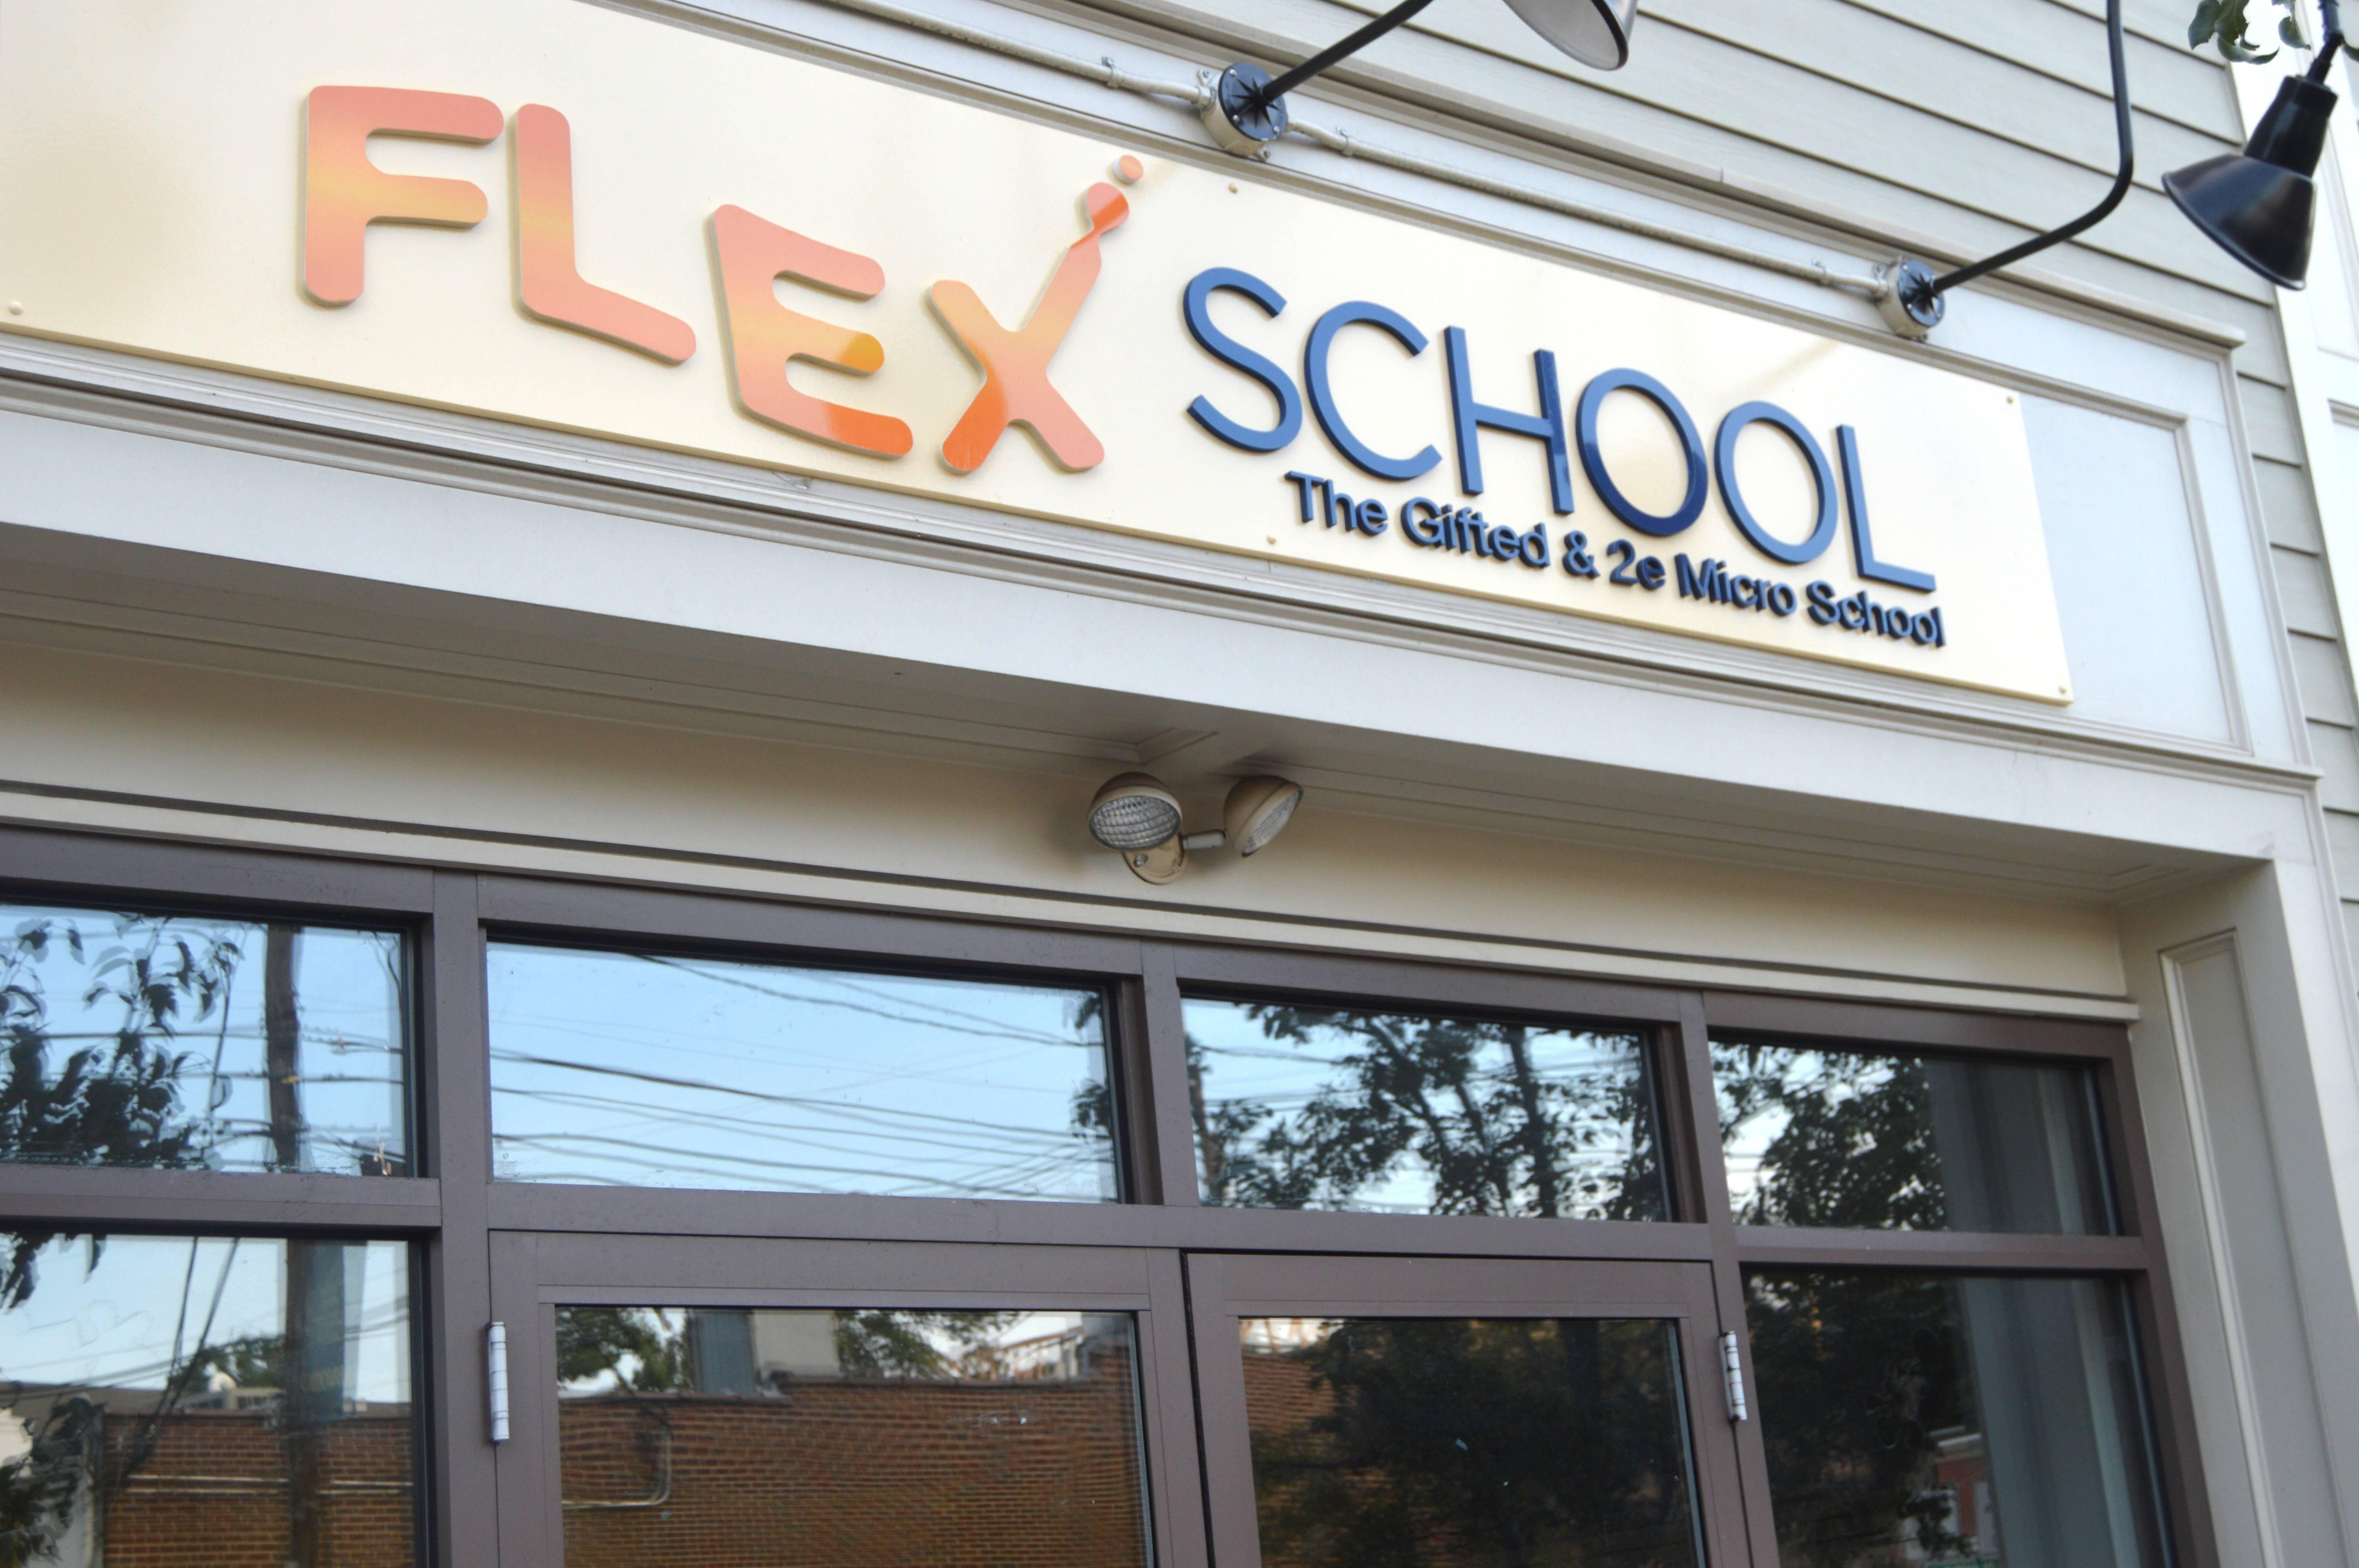 a9ba76093e7a79b78a88_Flex_School_9-9-16.JPG